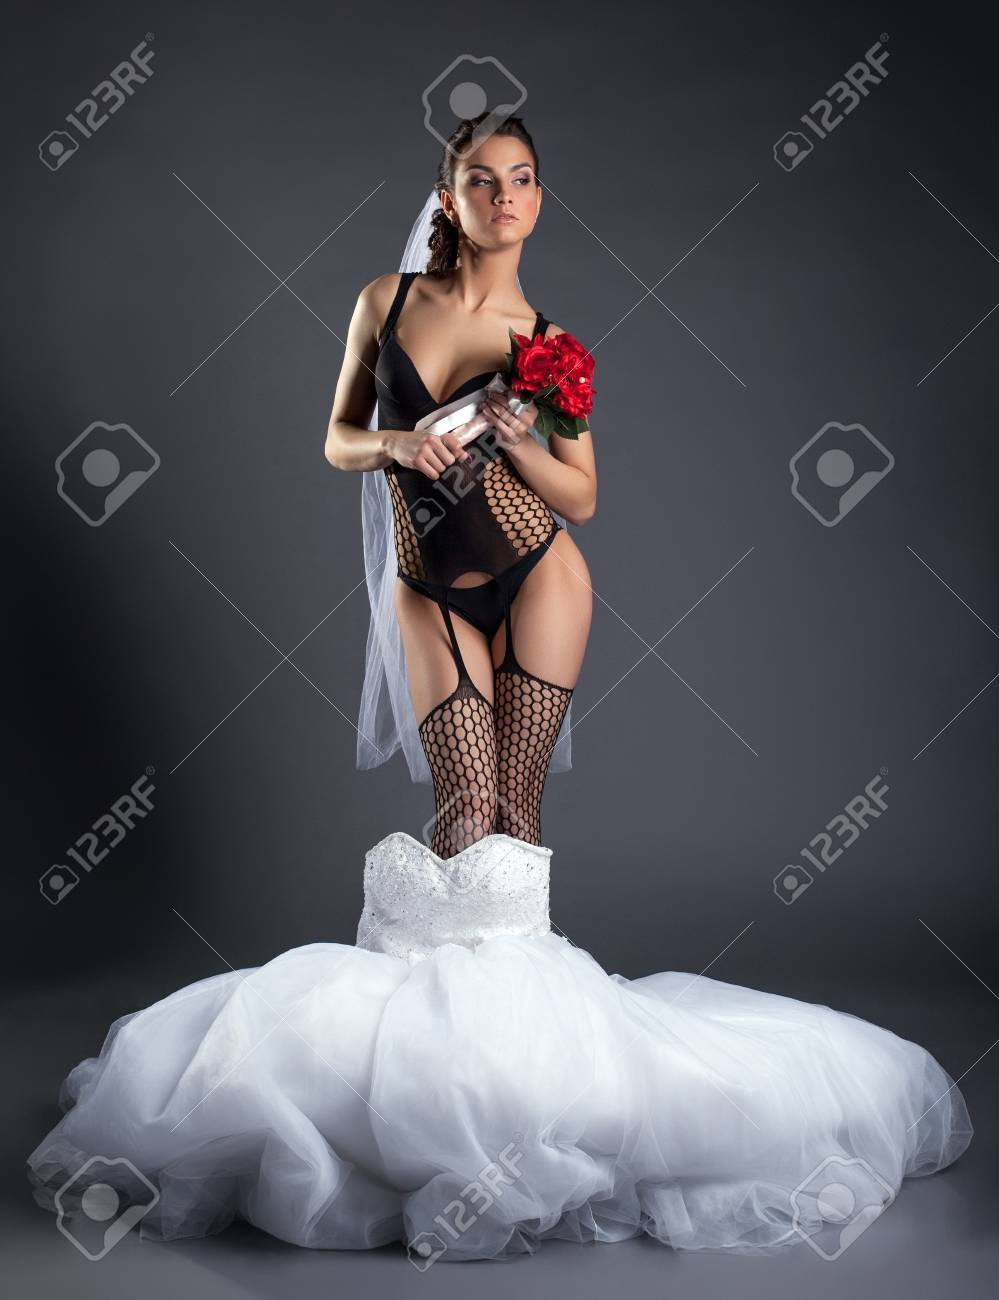 83437e77c Proud bride posing in erotic lingerie, on gray background Stock Photo -  19730897